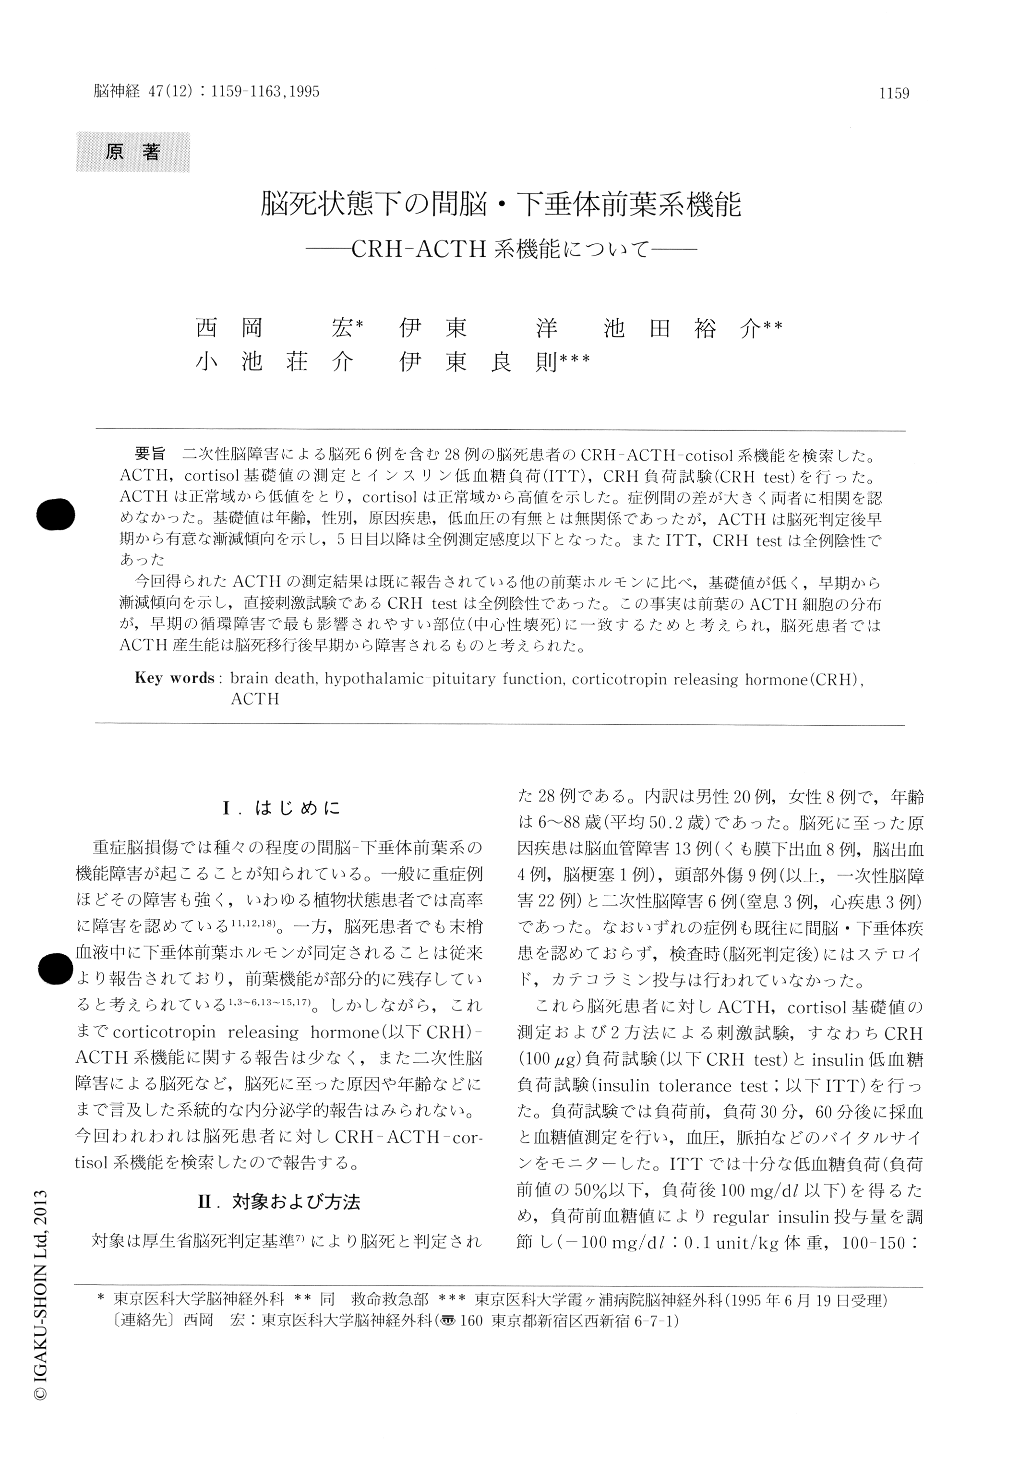 acth stimulation test protocol pdf